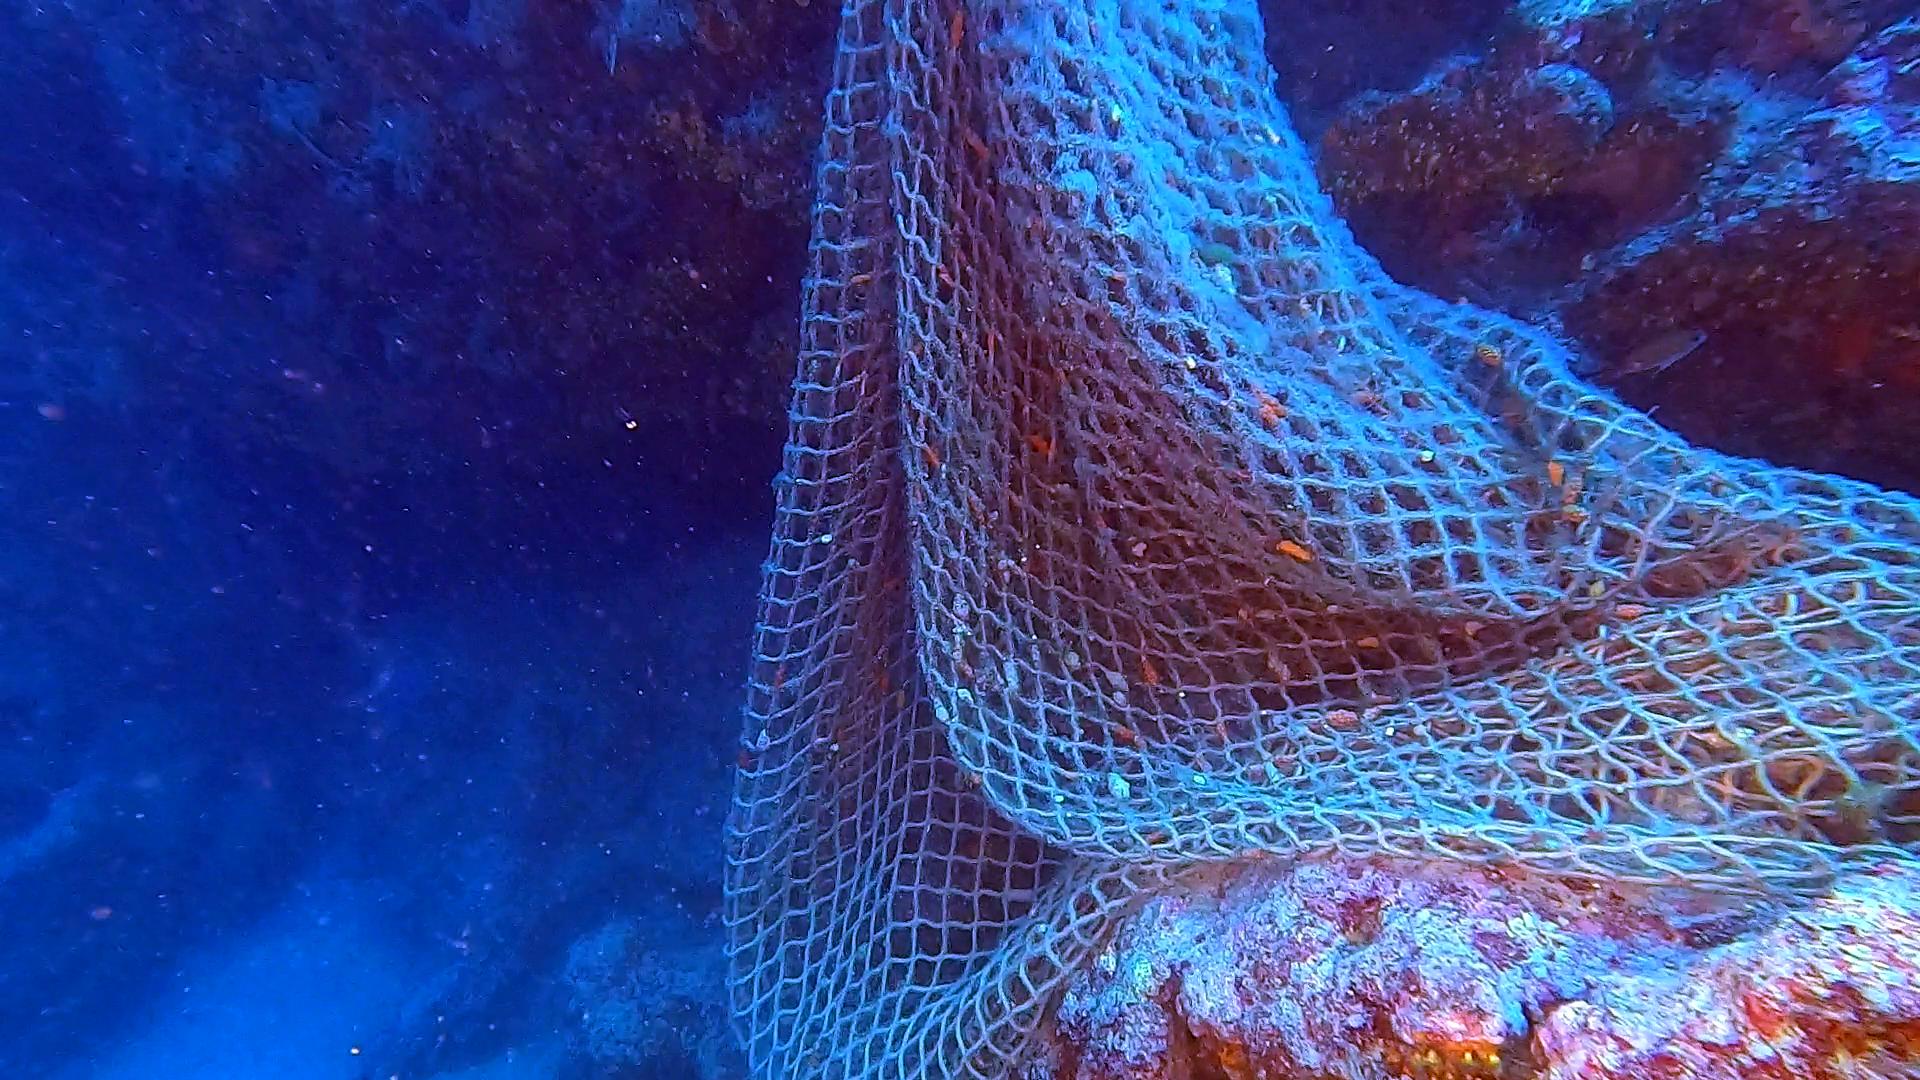 SOS Mediterraneo e Oceani - SOS Mediterranean sea and Oceans - Rete a strascico afferrata - grabbed Trawl net - intotheblue.it